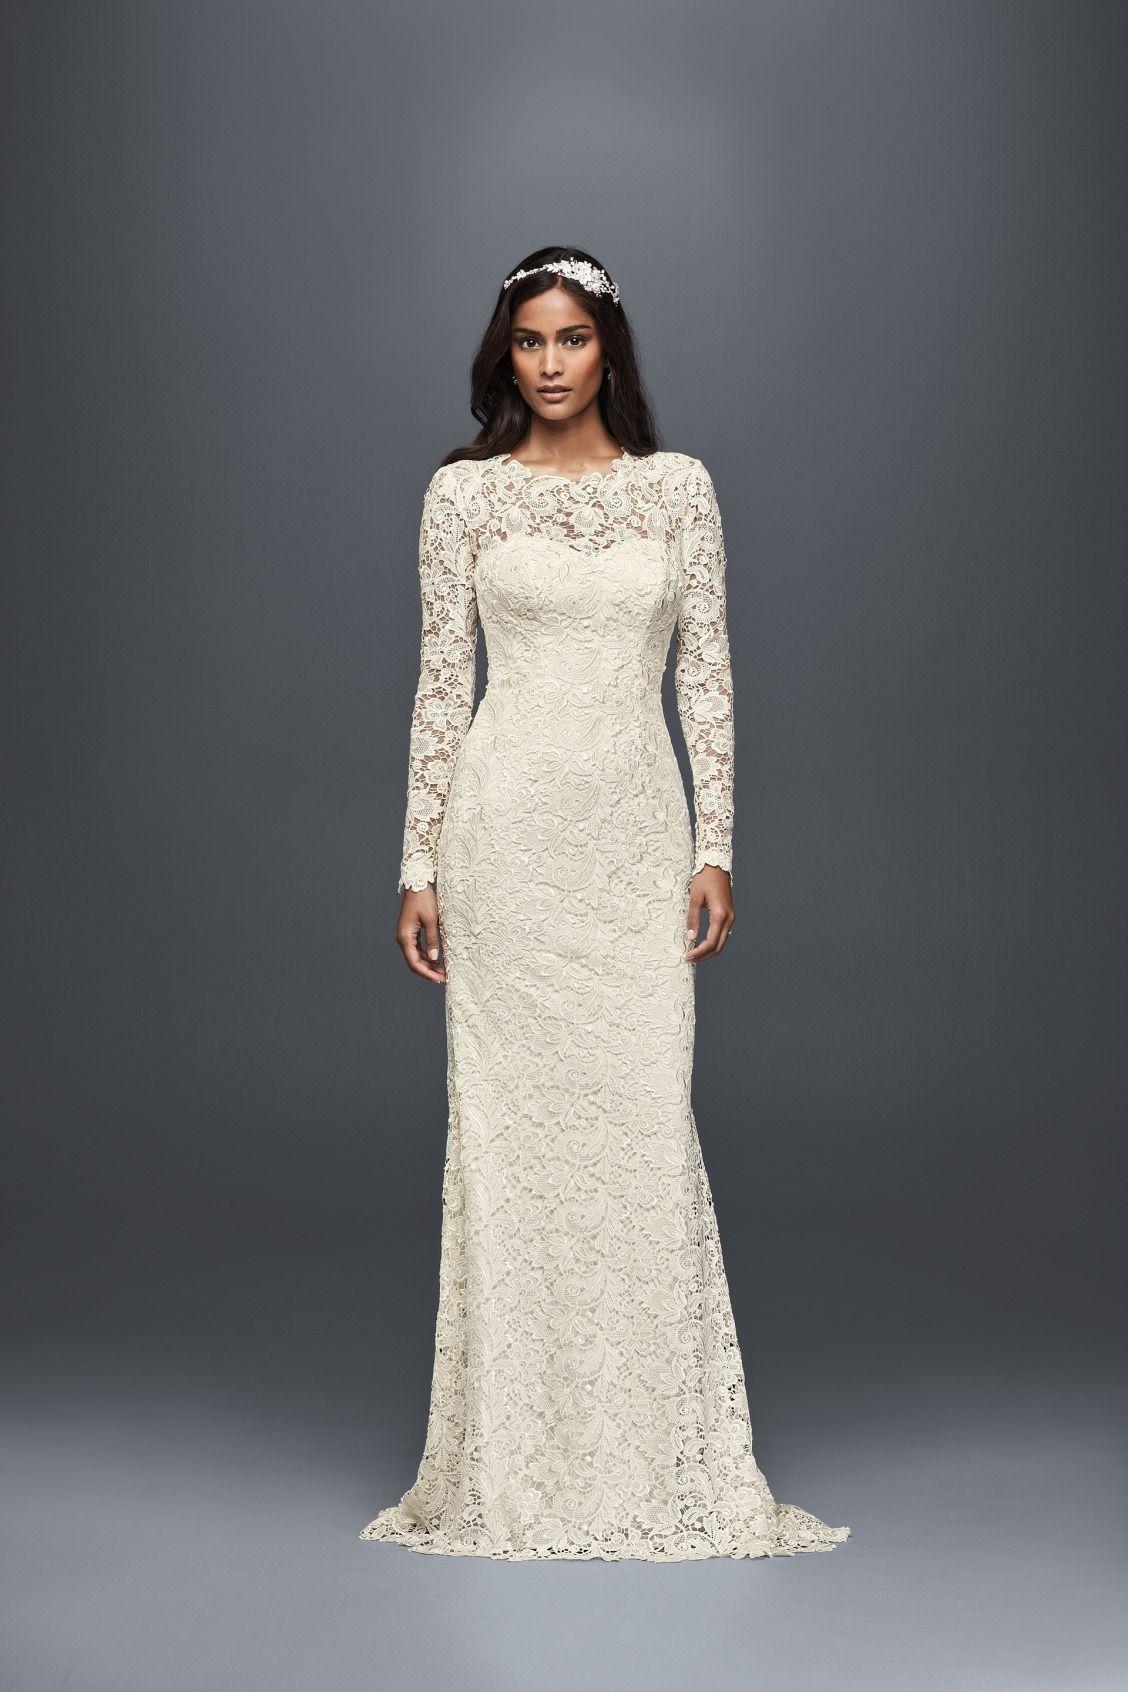 Long Sleeve Lace Sheath Wedding Dress David S Bridal Sheath Wedding Dress Lace Long Sleeve Wedding Dress Lace Sheath Wedding Dress